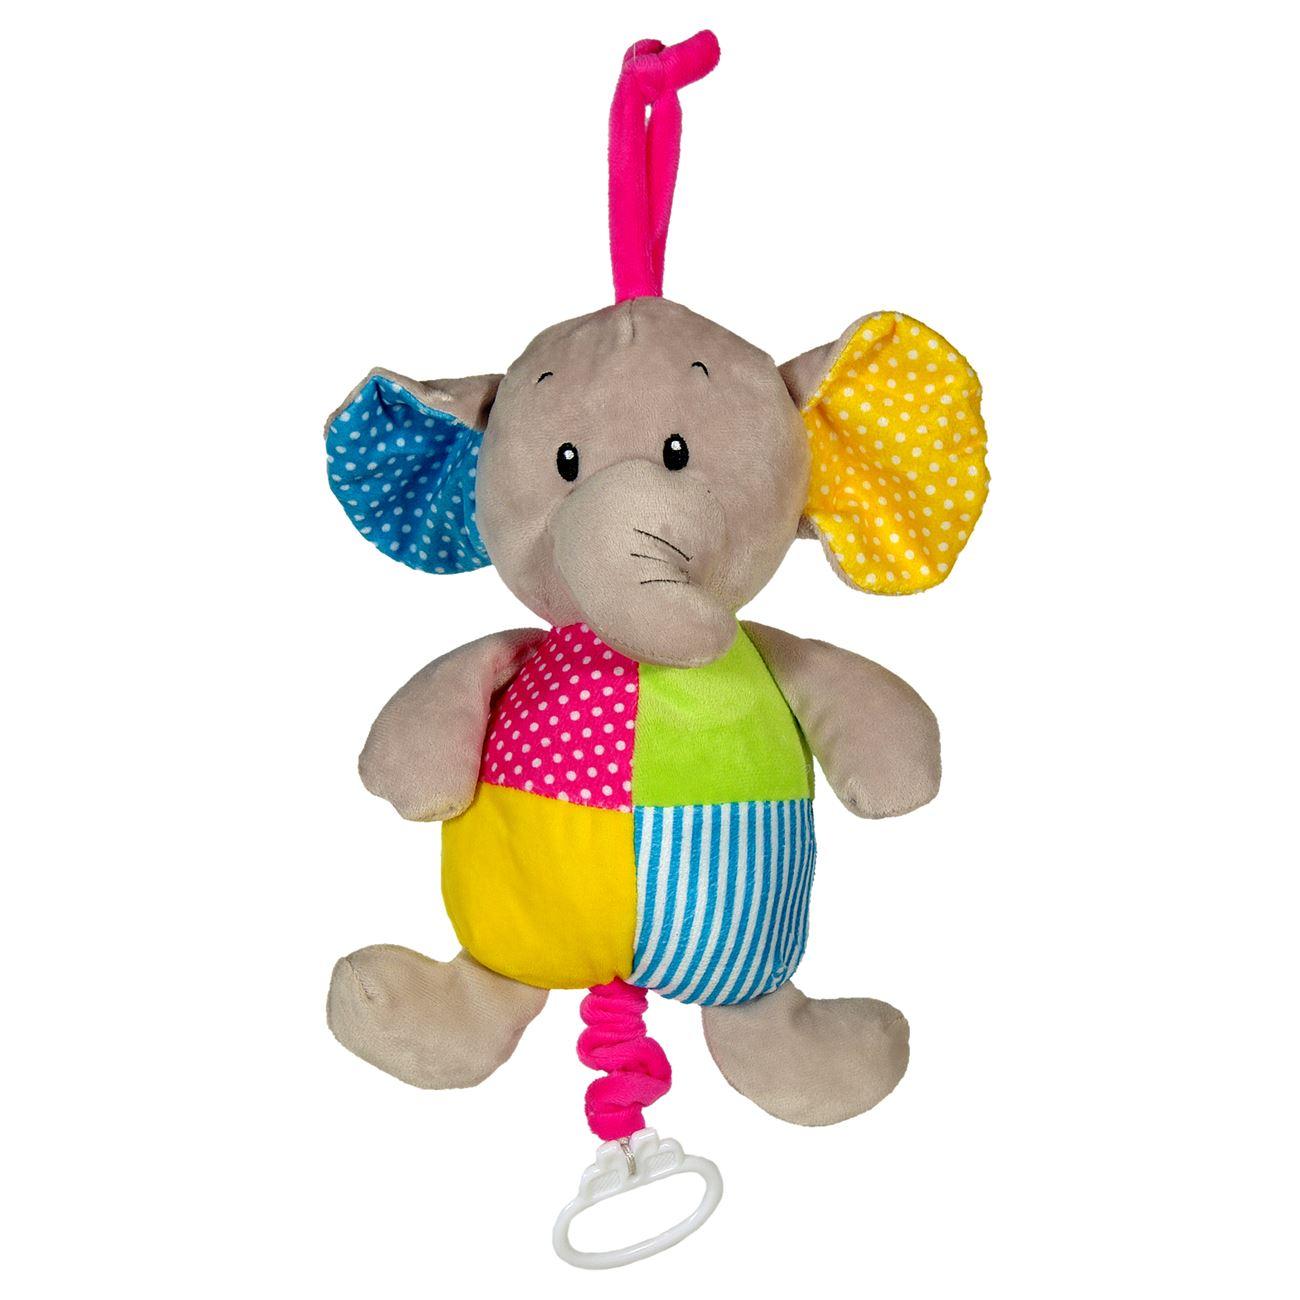 1fa5b5bab50 Παιχνίδι Κούνιας Ελέφαντας με Μουσική 27 εκ. < Μουσικα Παιχνίδια Κρεβατιού  Τραβηχτά | Jumbo